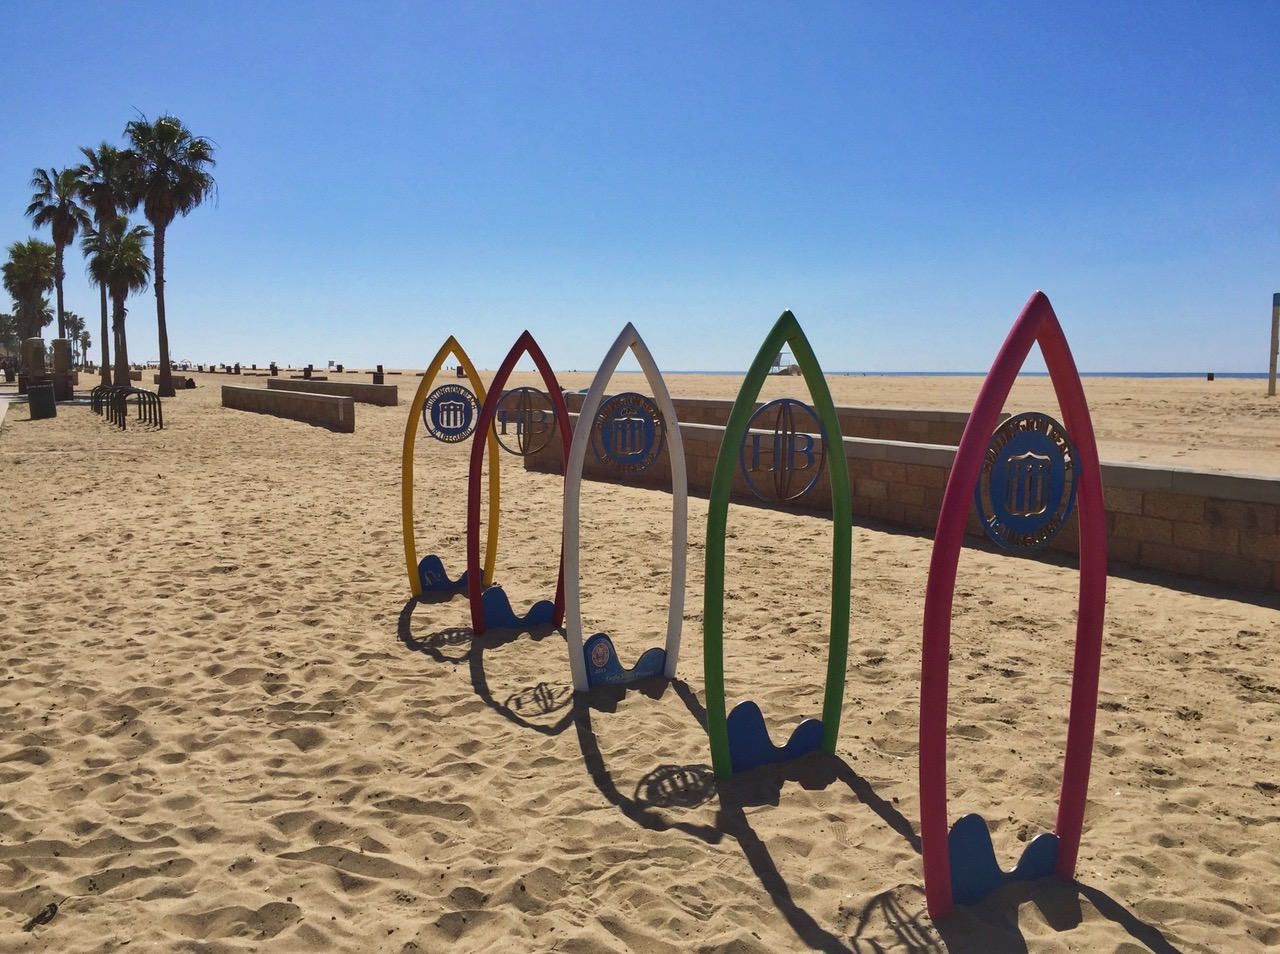 Huntington Beach beach view with surf boards